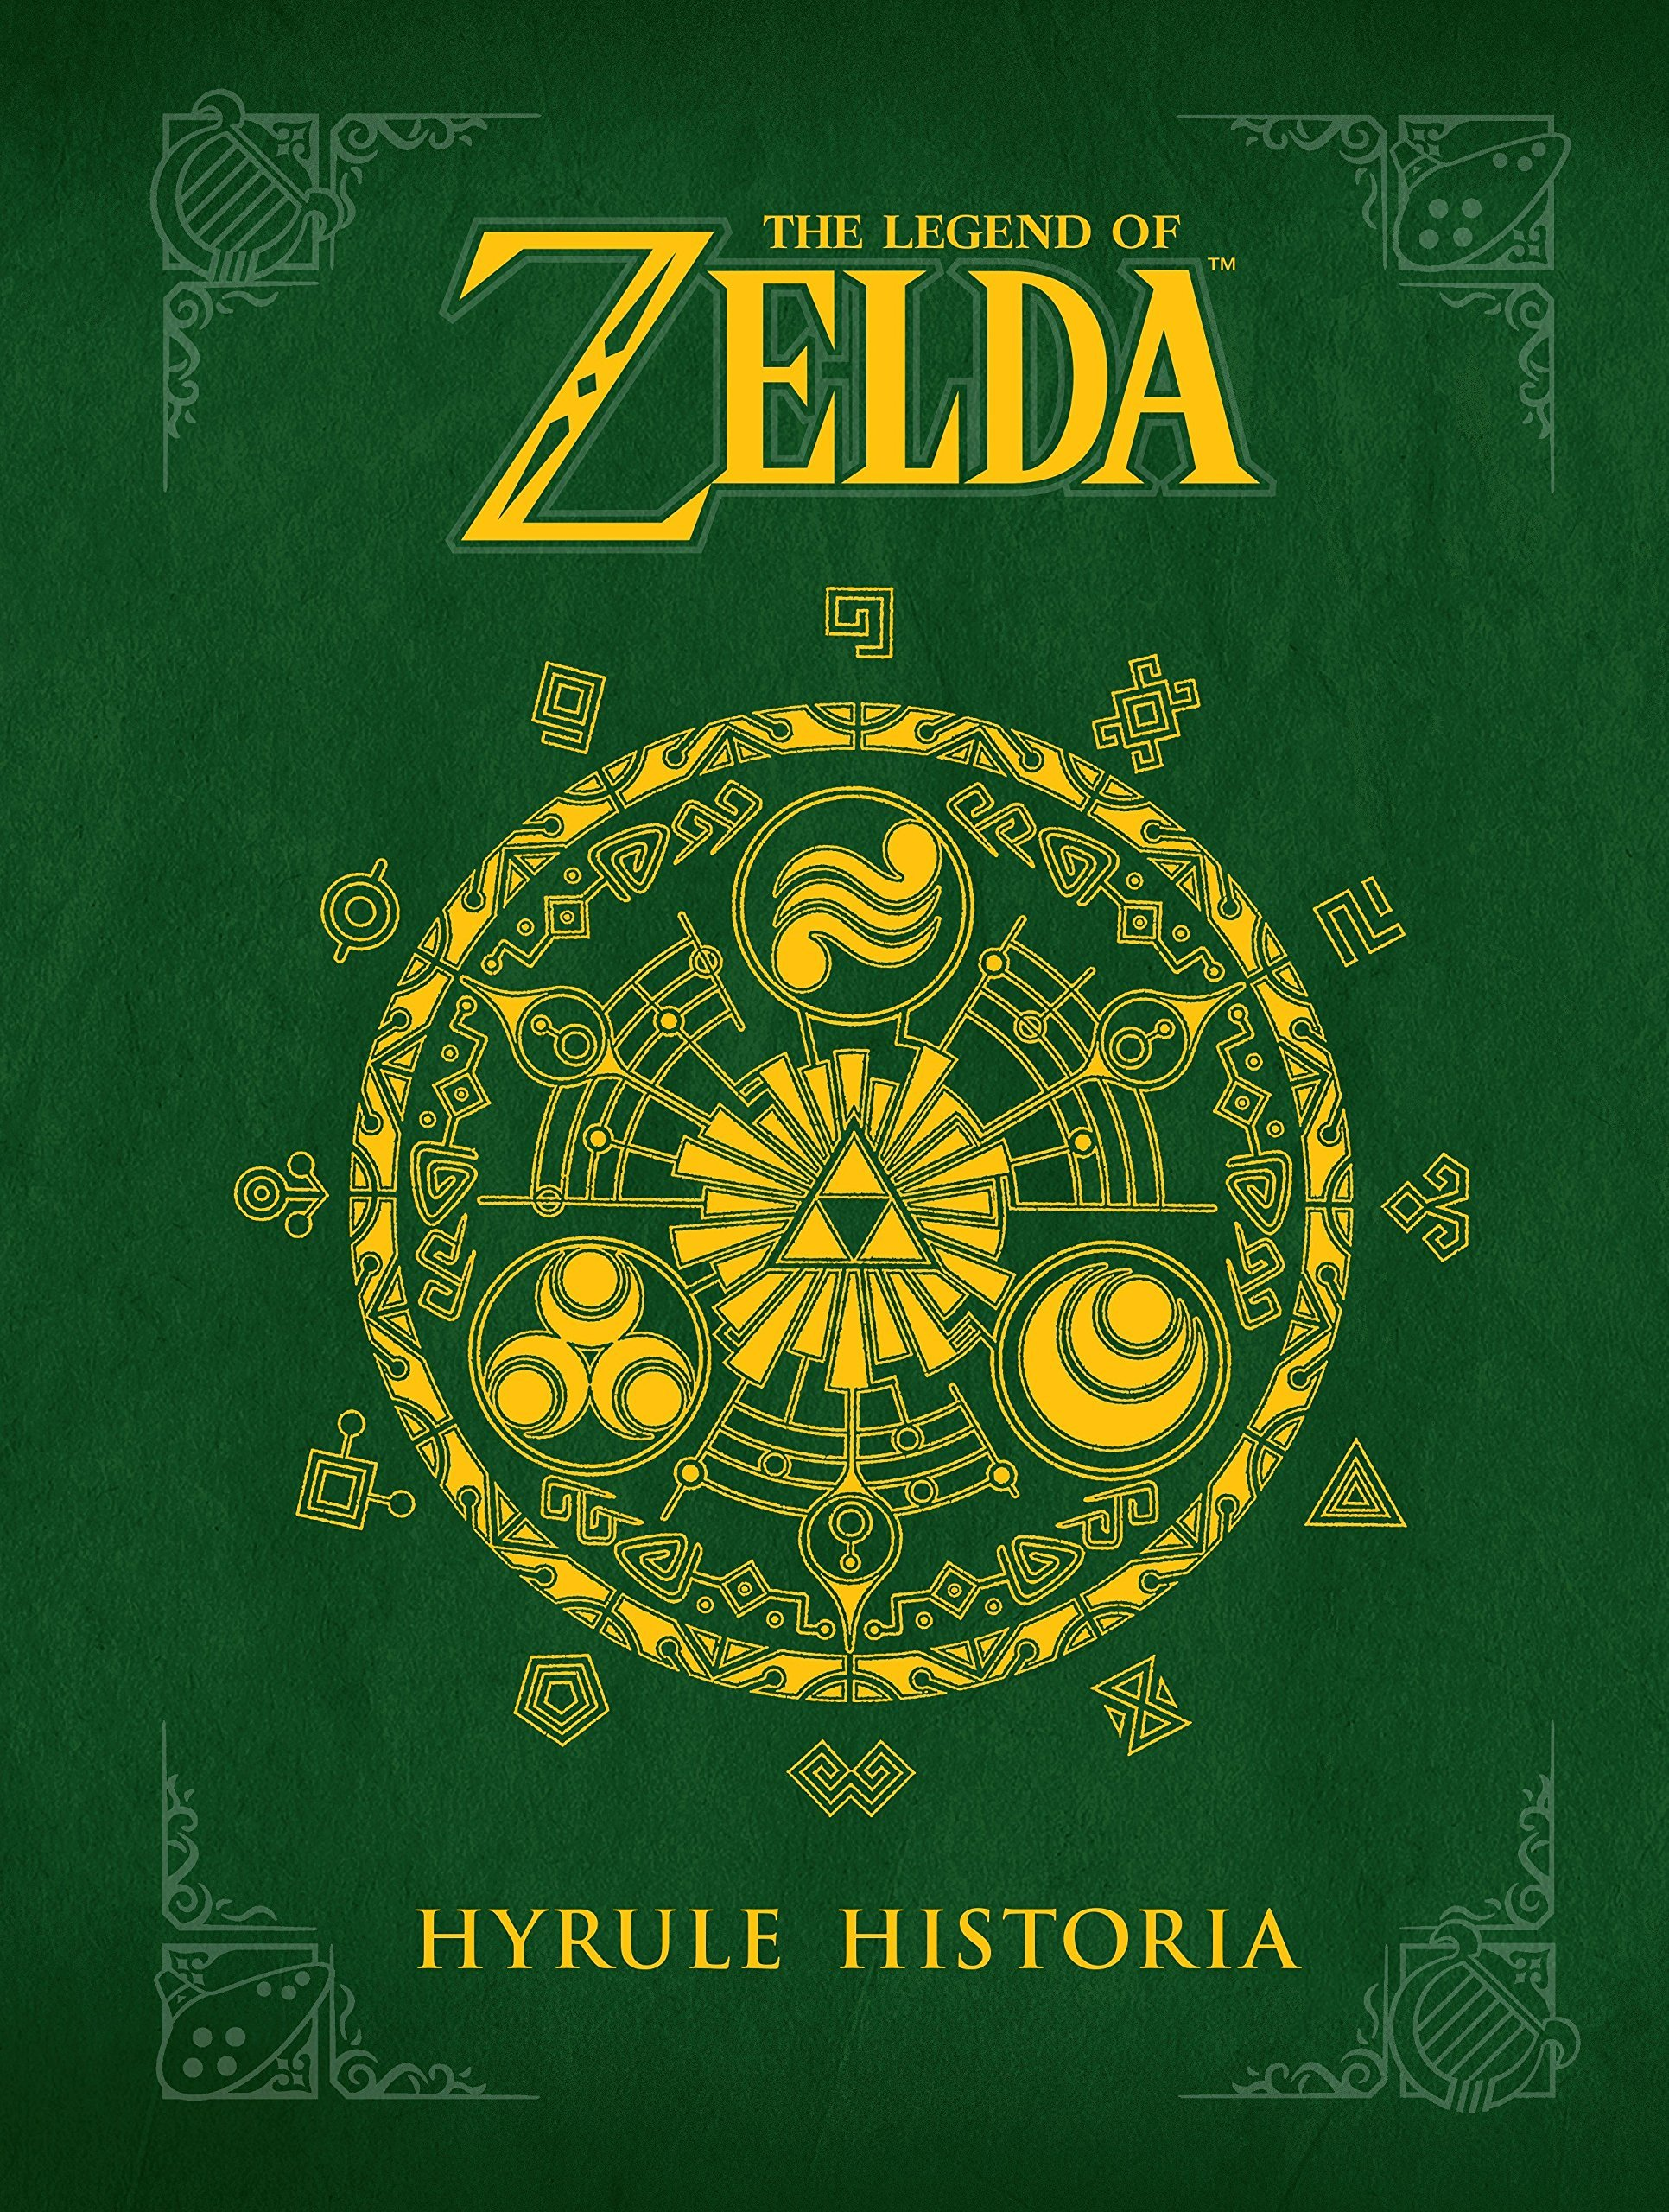 Legend of Zelda, The - Hyrule Historia